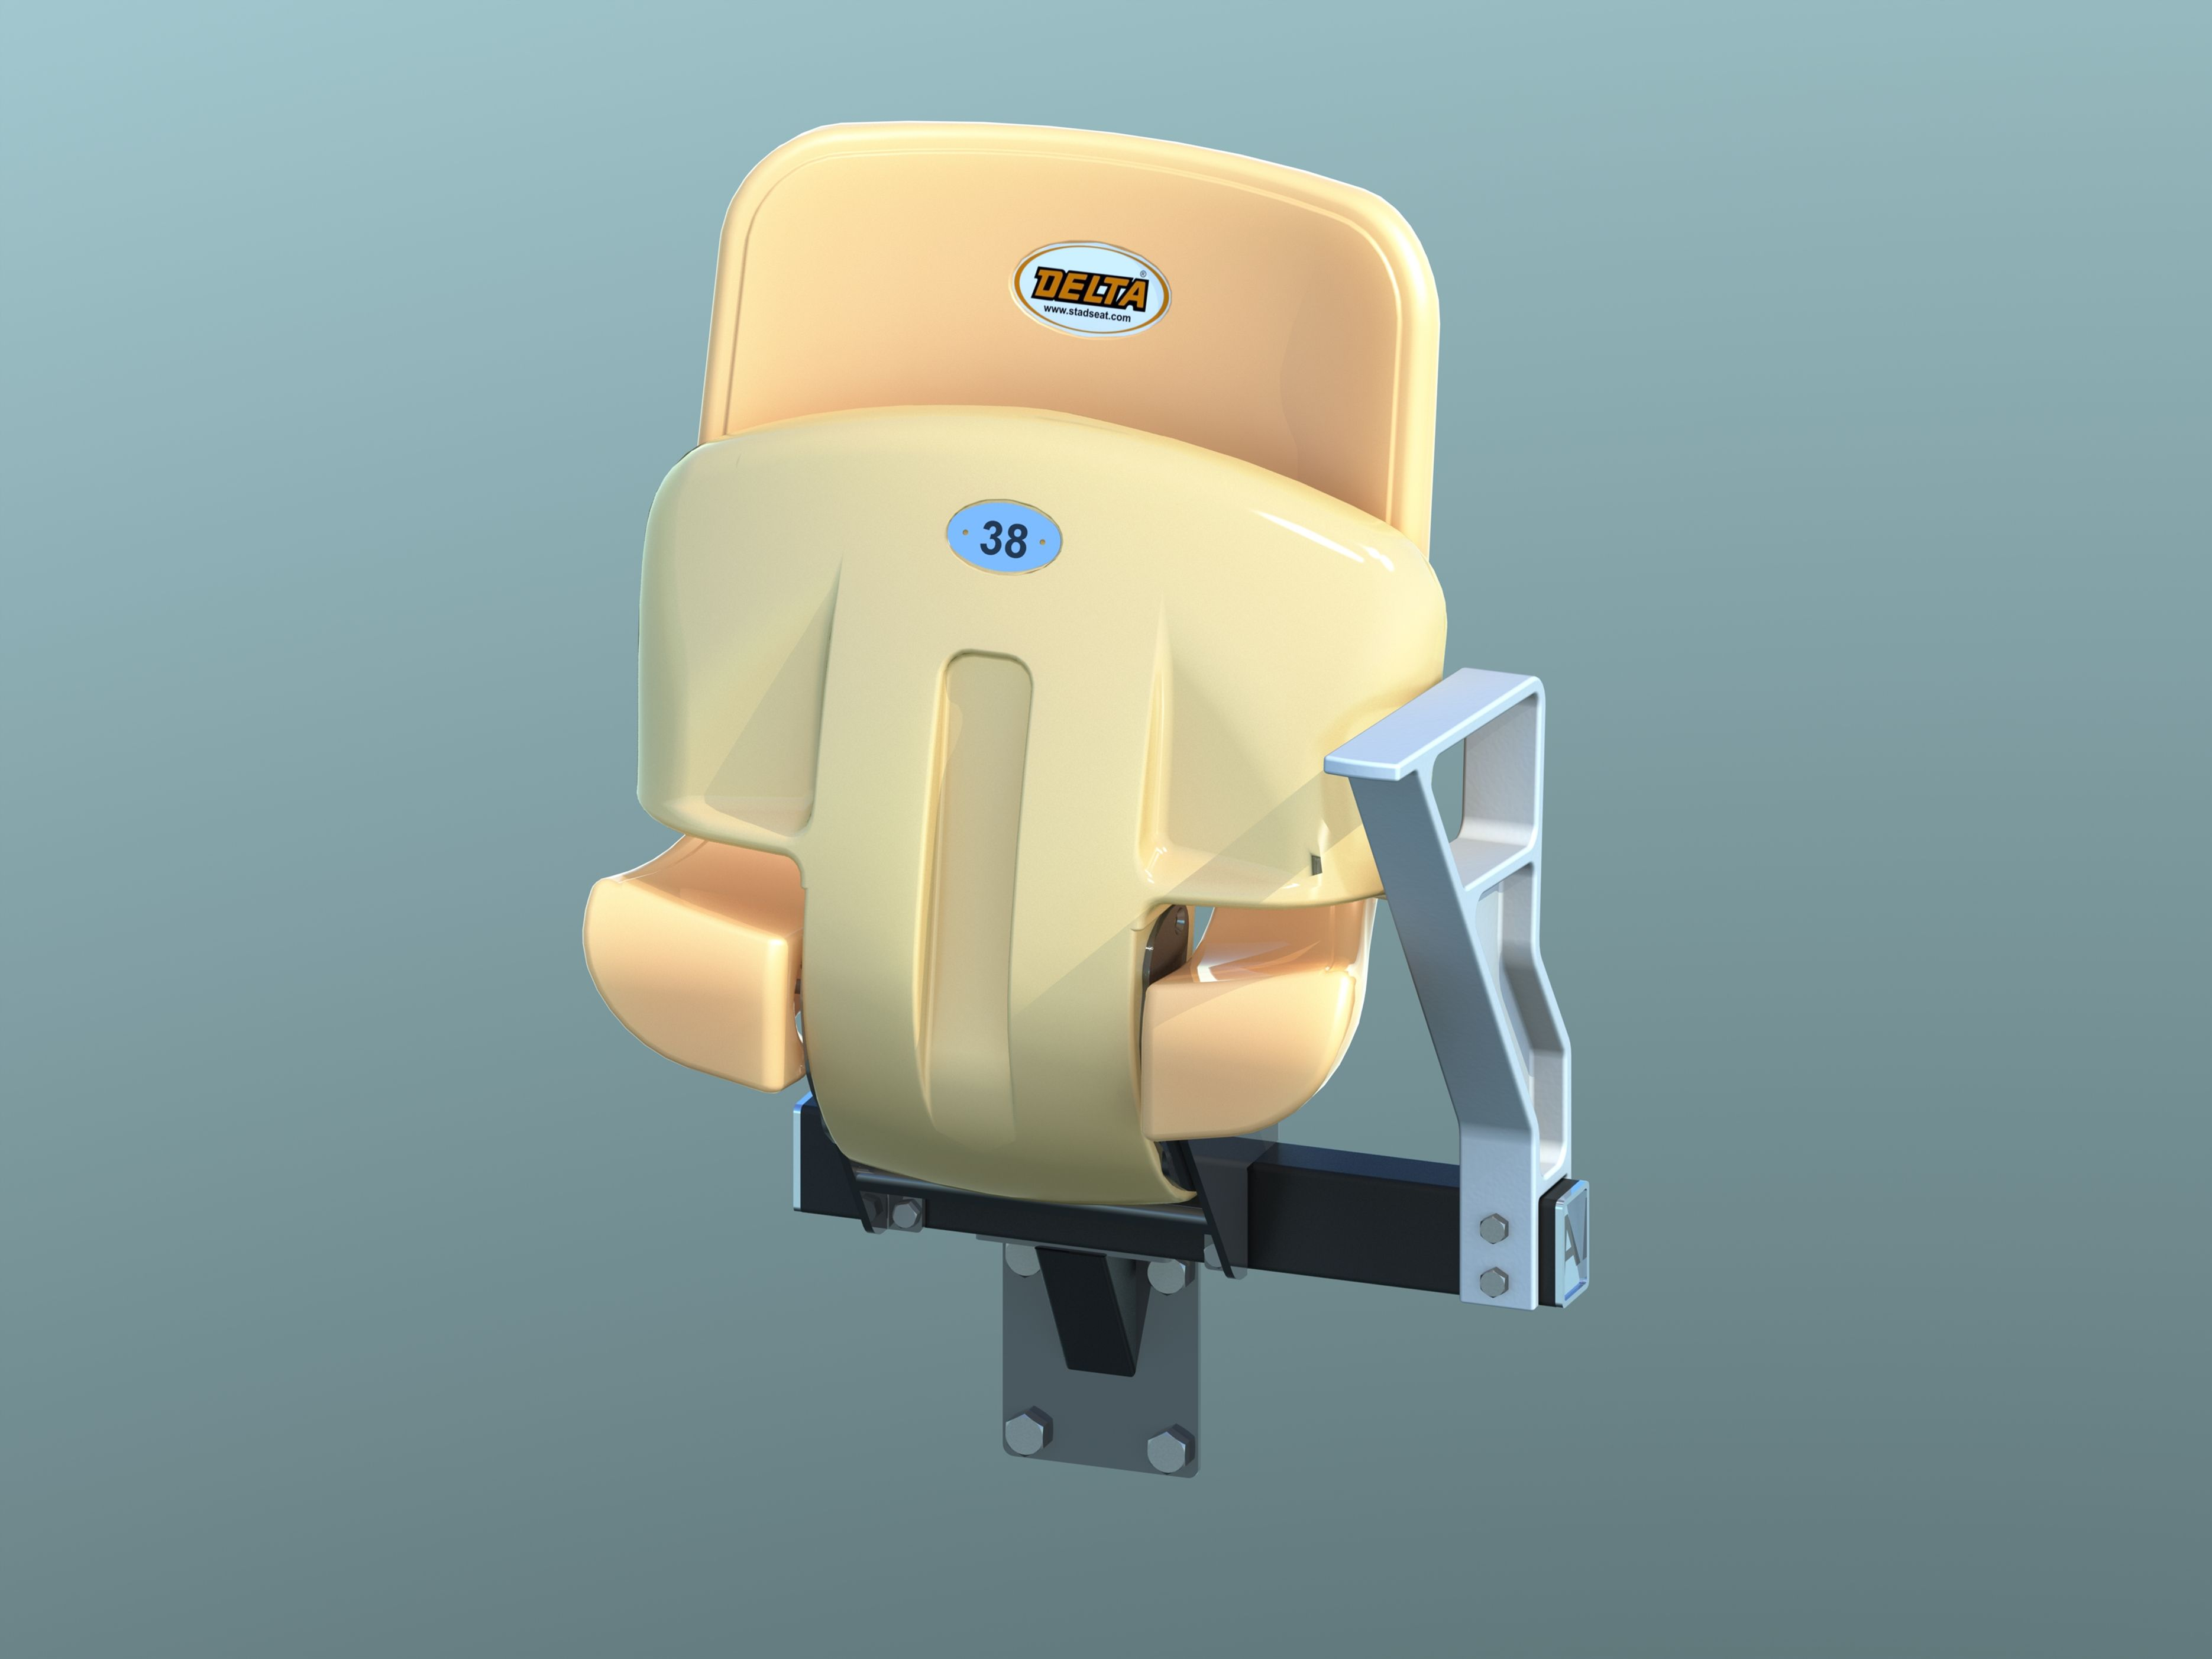 linea_backrest_monoblock_copolymer_pp_stadium_chair_seatorium_06